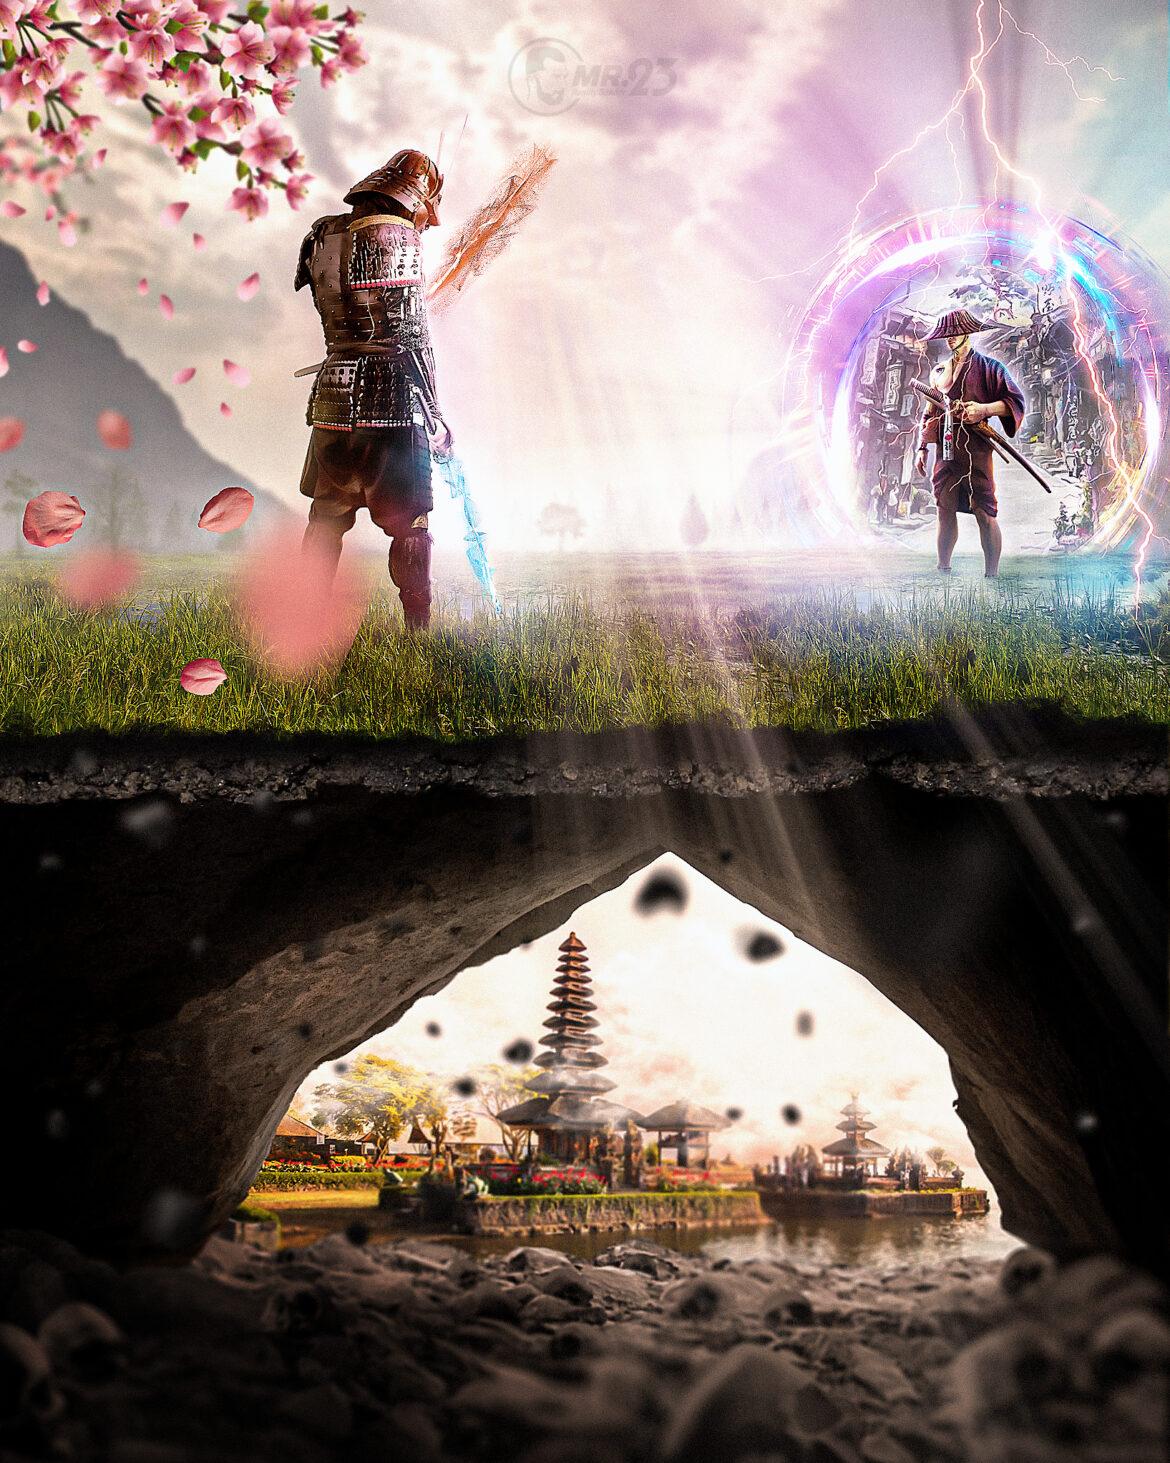 The Last Samurai - Photo Manipulation